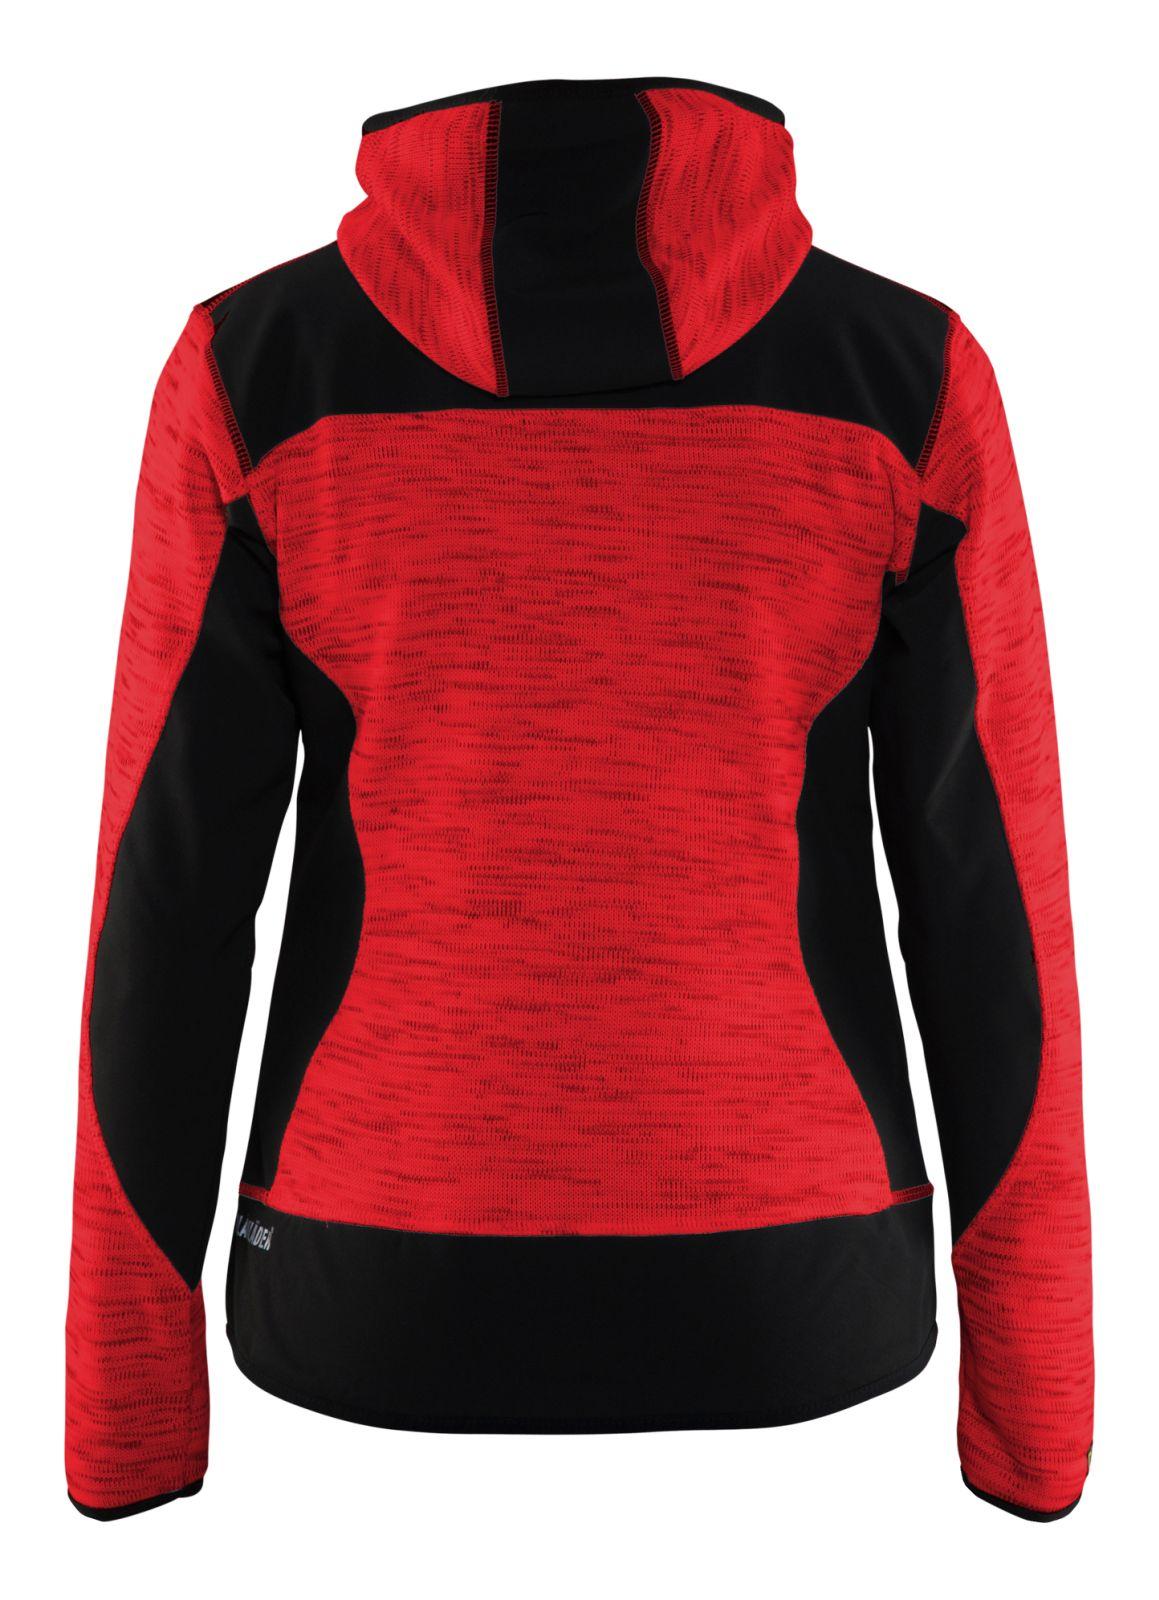 Blaklader Vesten 49312117 rood-zwart(5699)